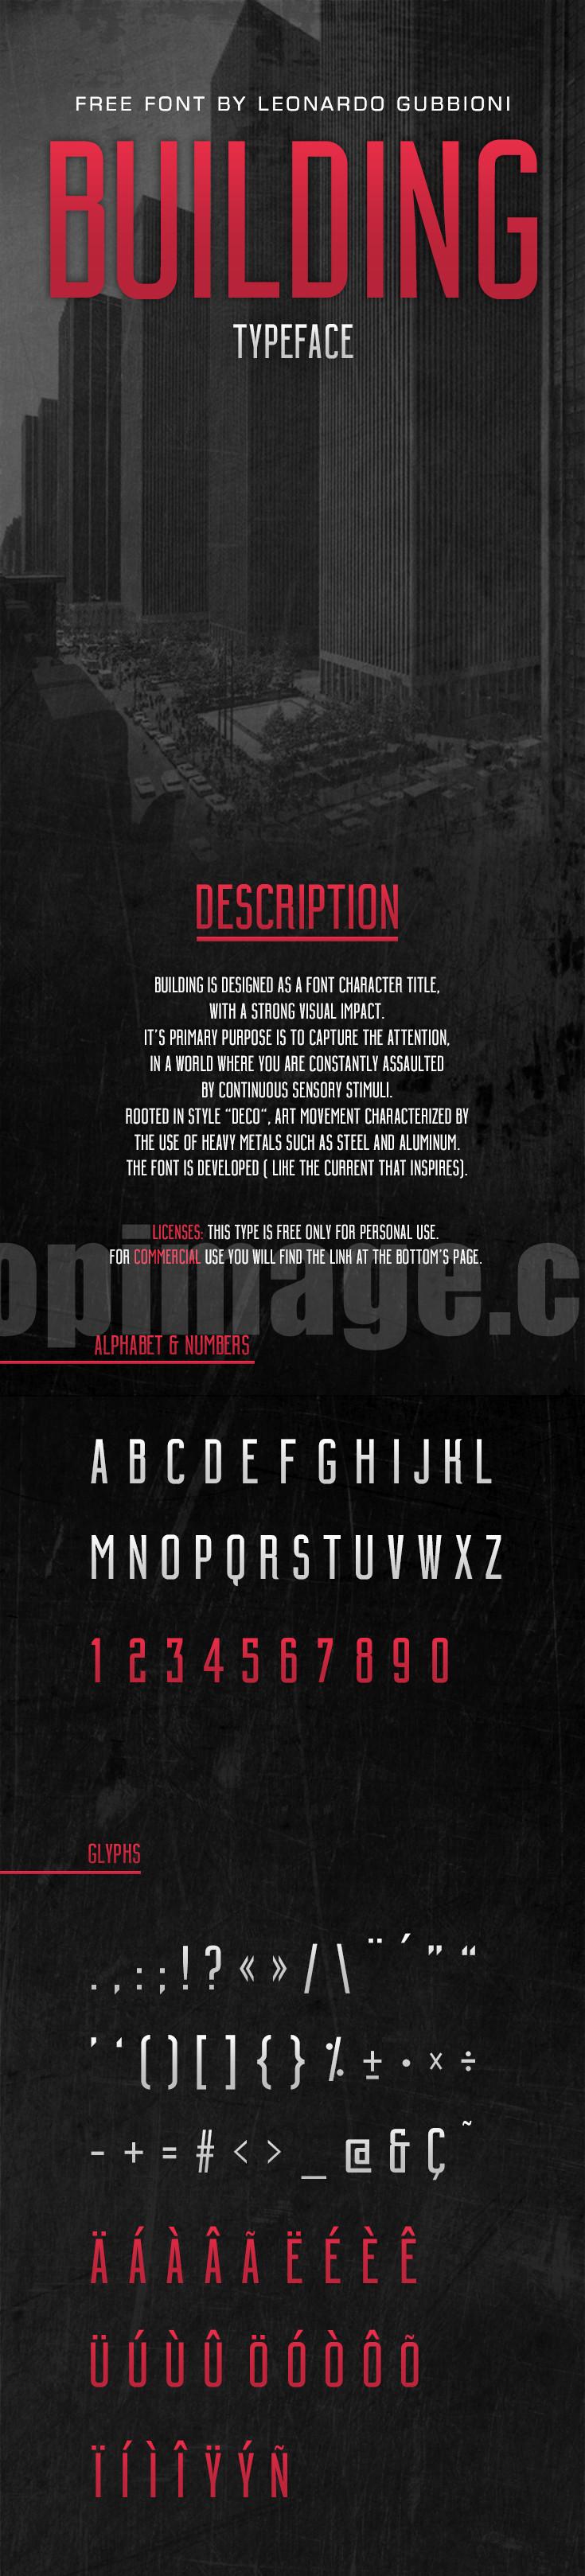 Building适合logo现代简洁海报细长英文字体